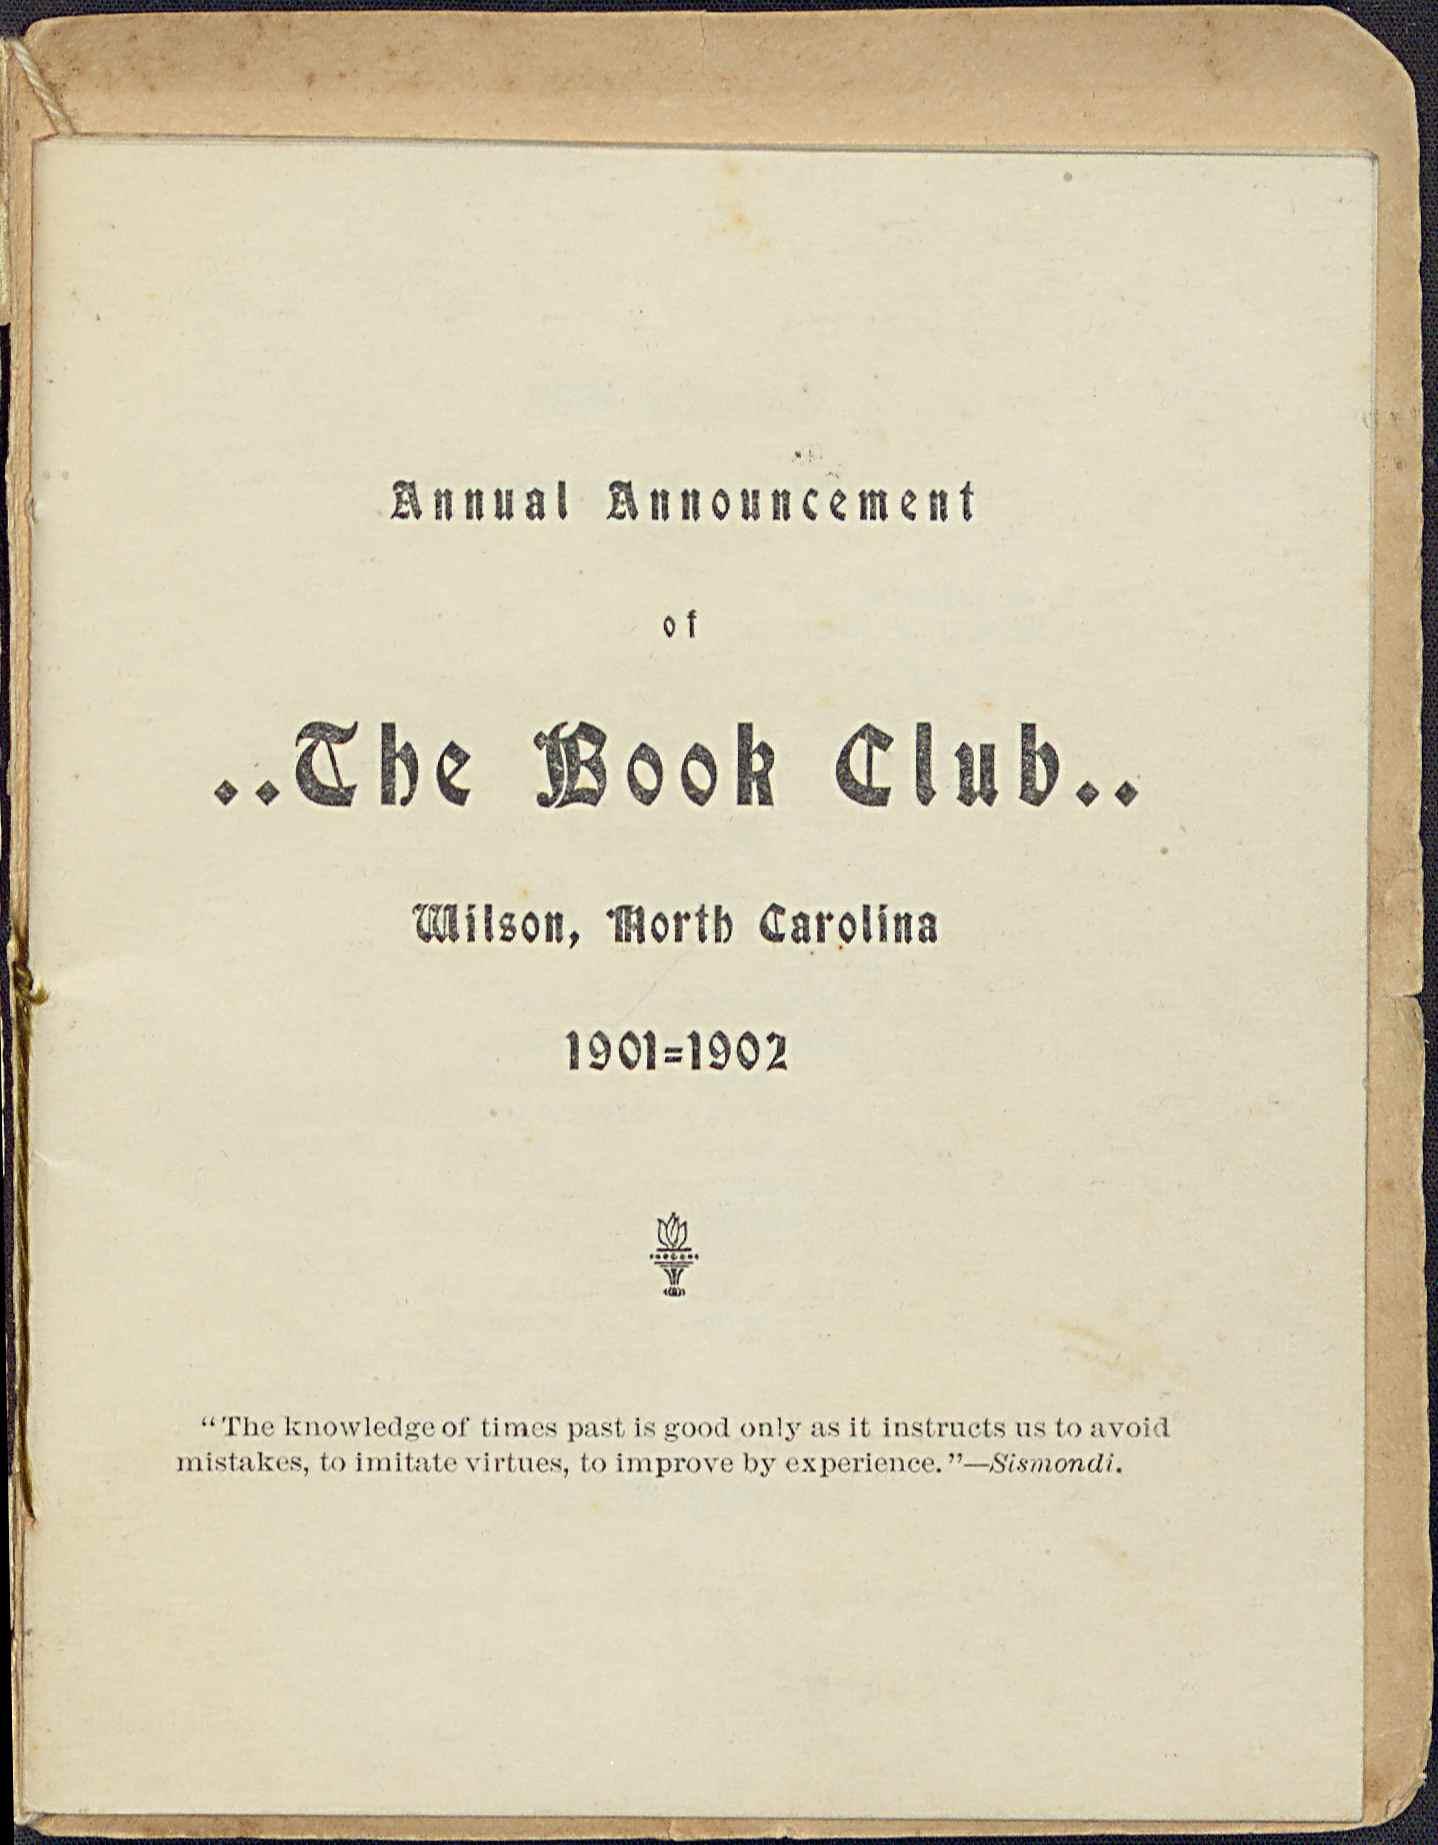 wilson_bookclub_0172